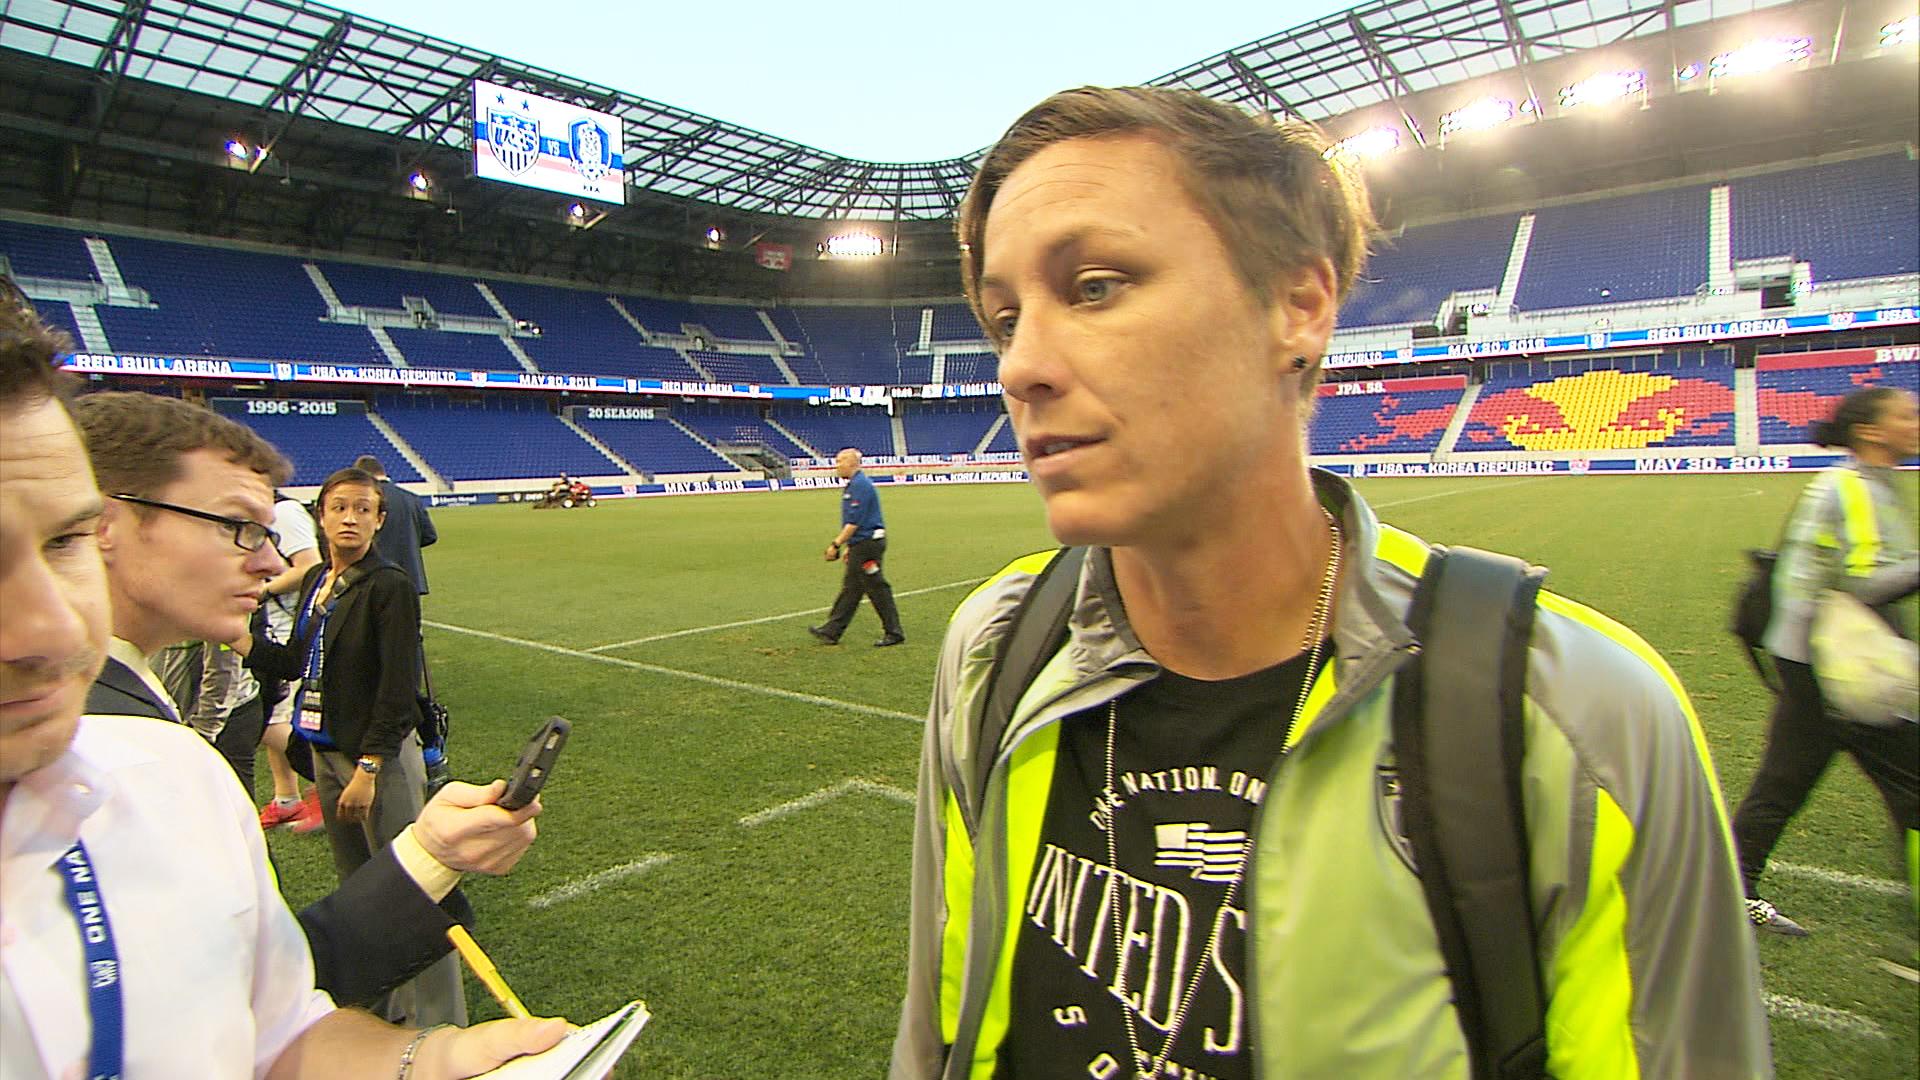 U.S. Soccer Star Abby Wambach: Playing on Turf a 'Nightmare'